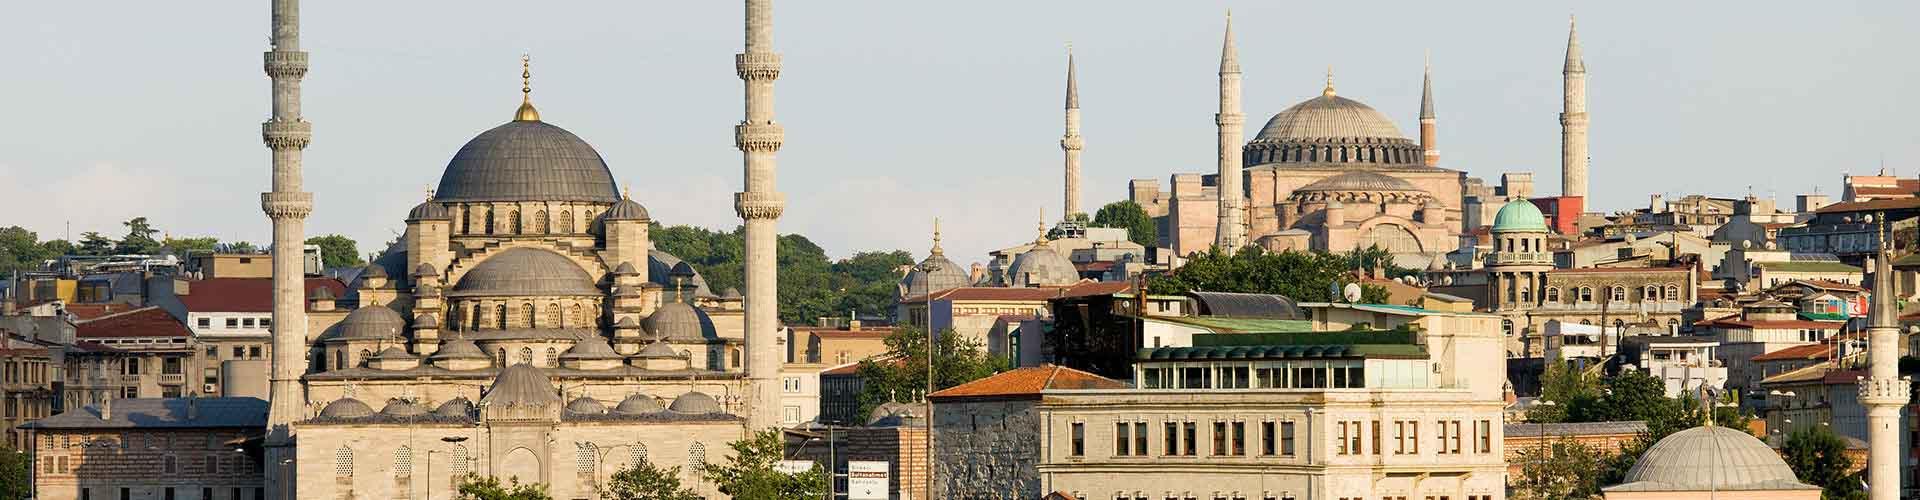 Istambul – Albergues em Istambul. Mapas para Istambul, Fotos e Avaliações para cada Albergue em Istambul.